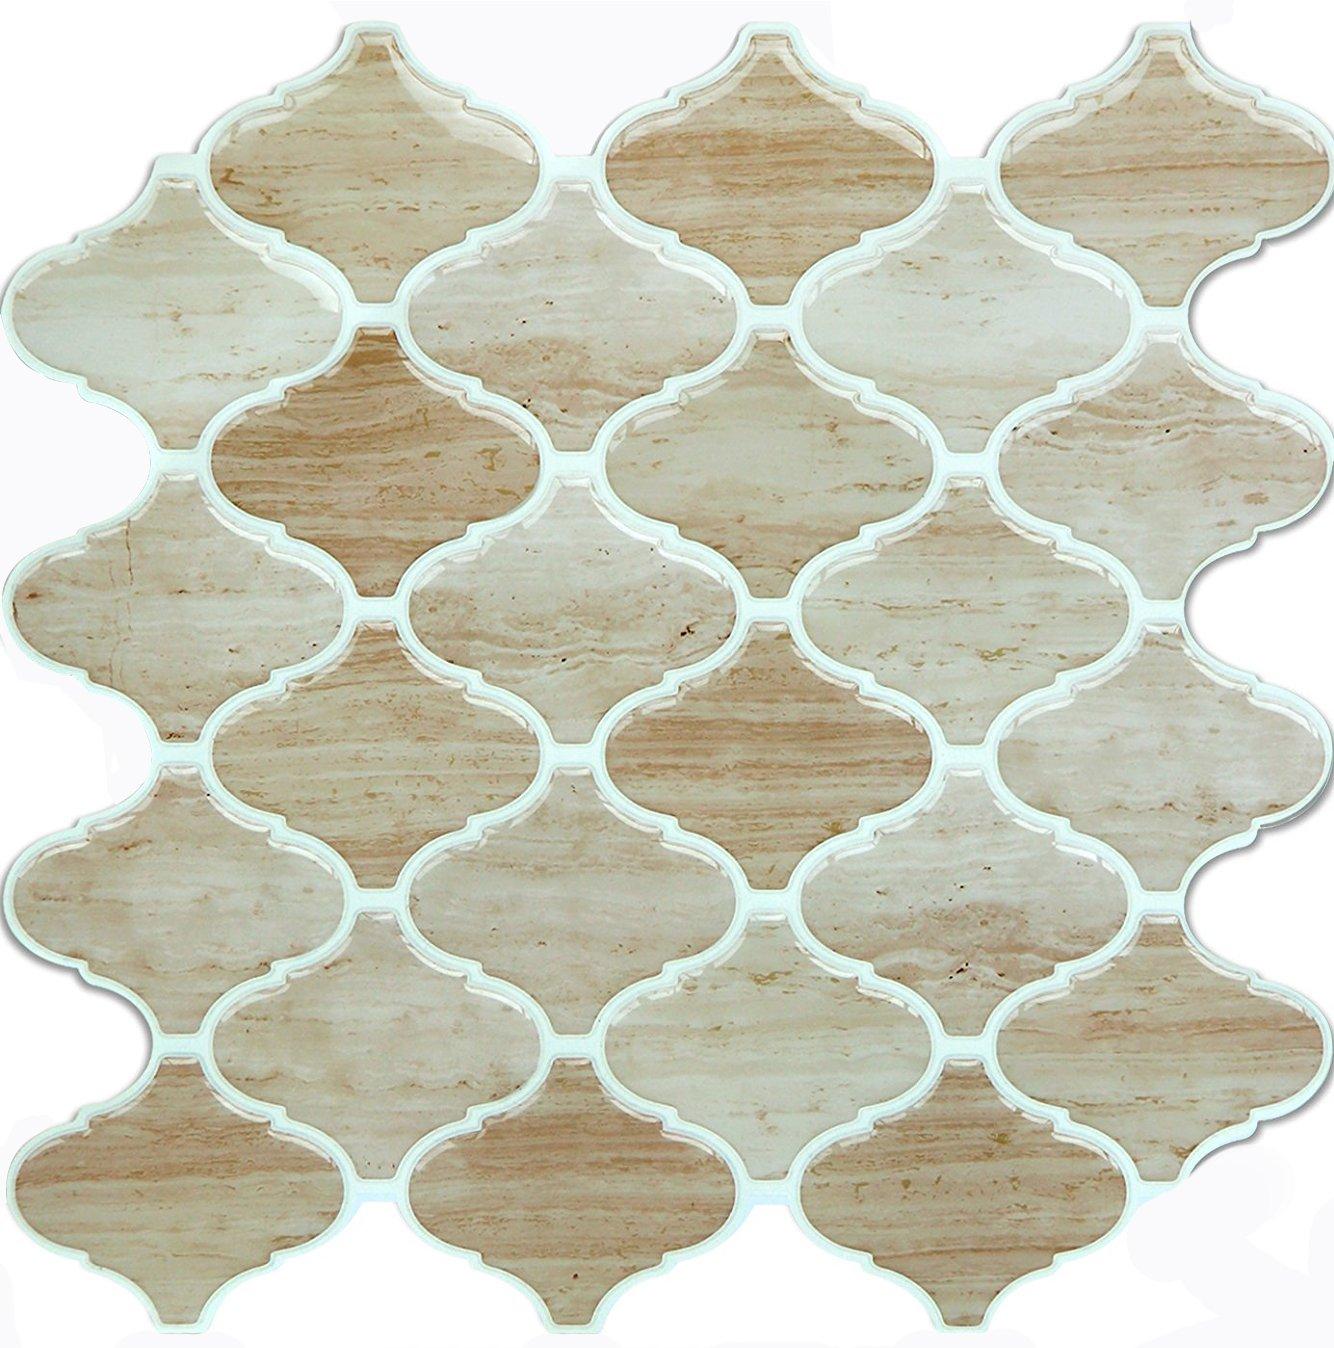 Vamos Tile Wood Grain Arabesque Peel and Stick Tile Backsplash,3D Self Adhesive Wall Tiles for Kitchen & Bathroom-10 x 10''(6 Tiles) by Vamos Tile